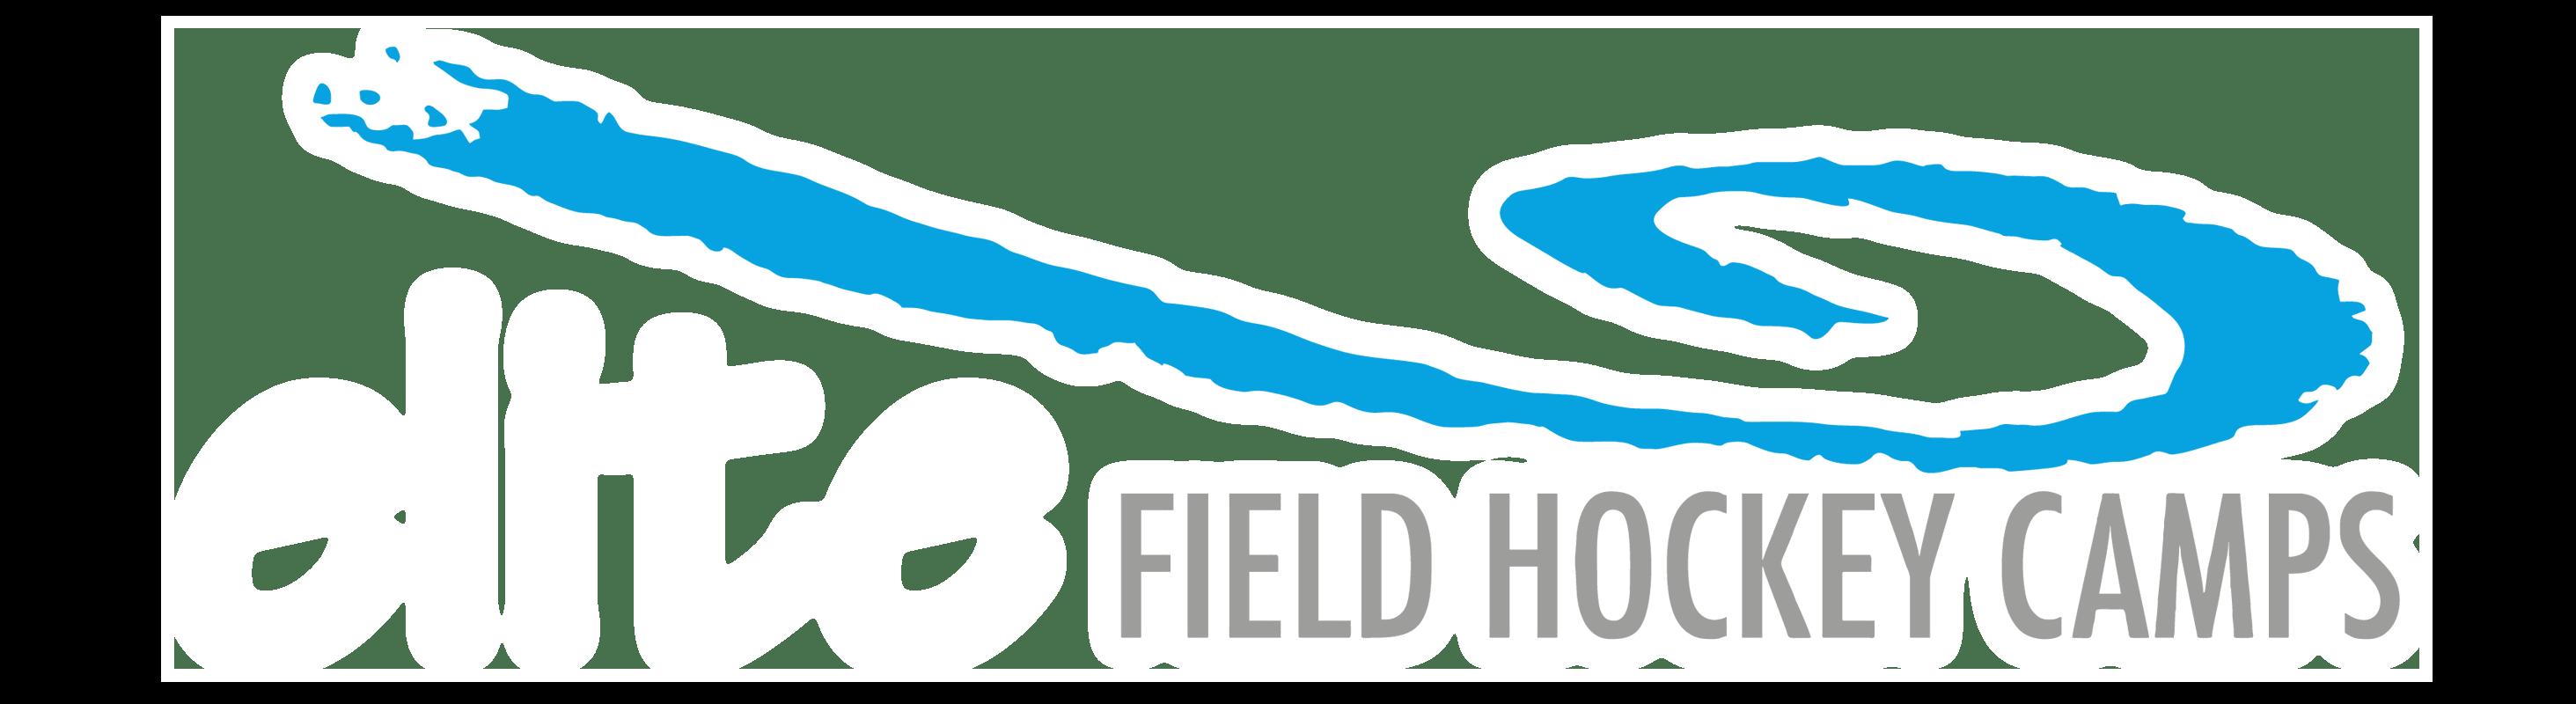 Elite Camp logo-min